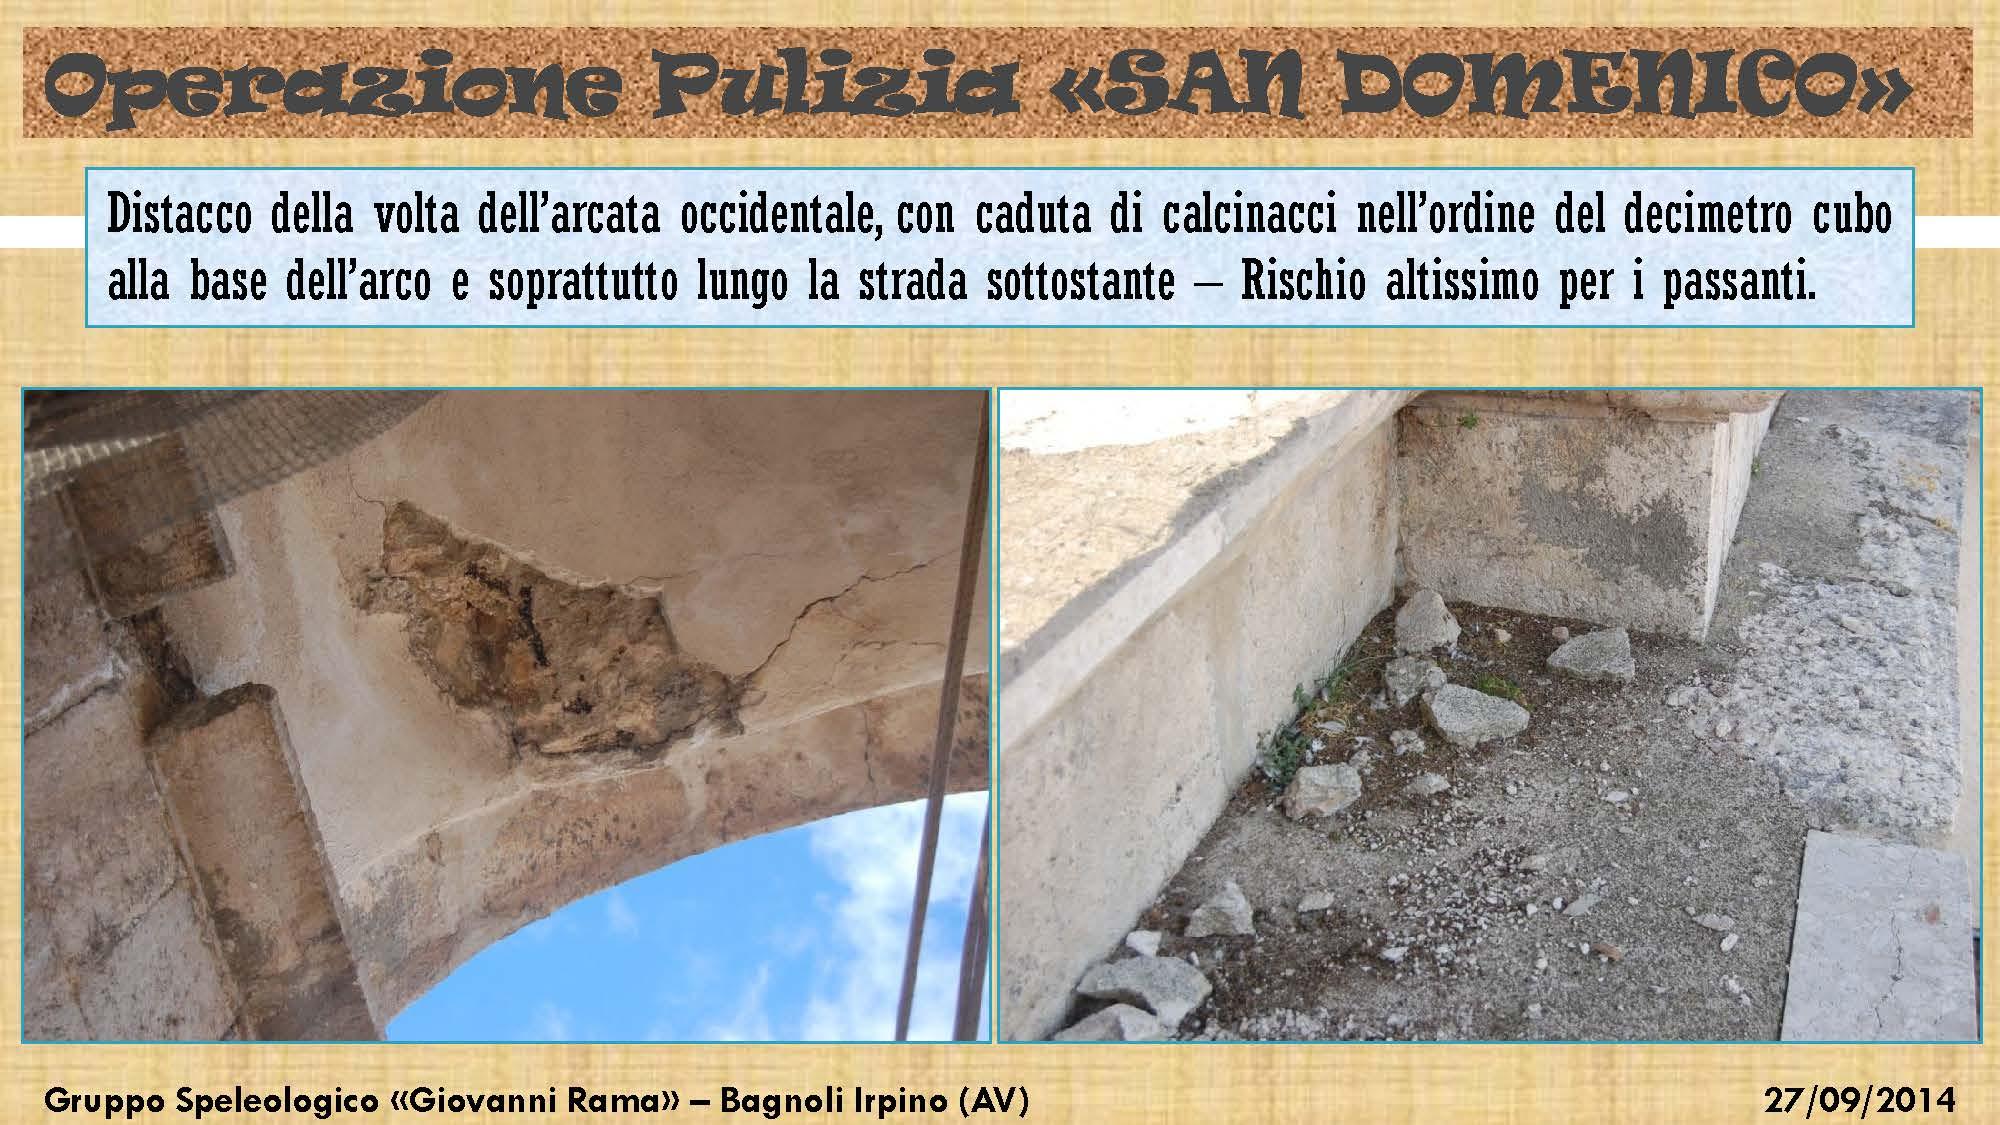 Bagnoli-Pulizia-San-Domenico-2014_Pagina_13